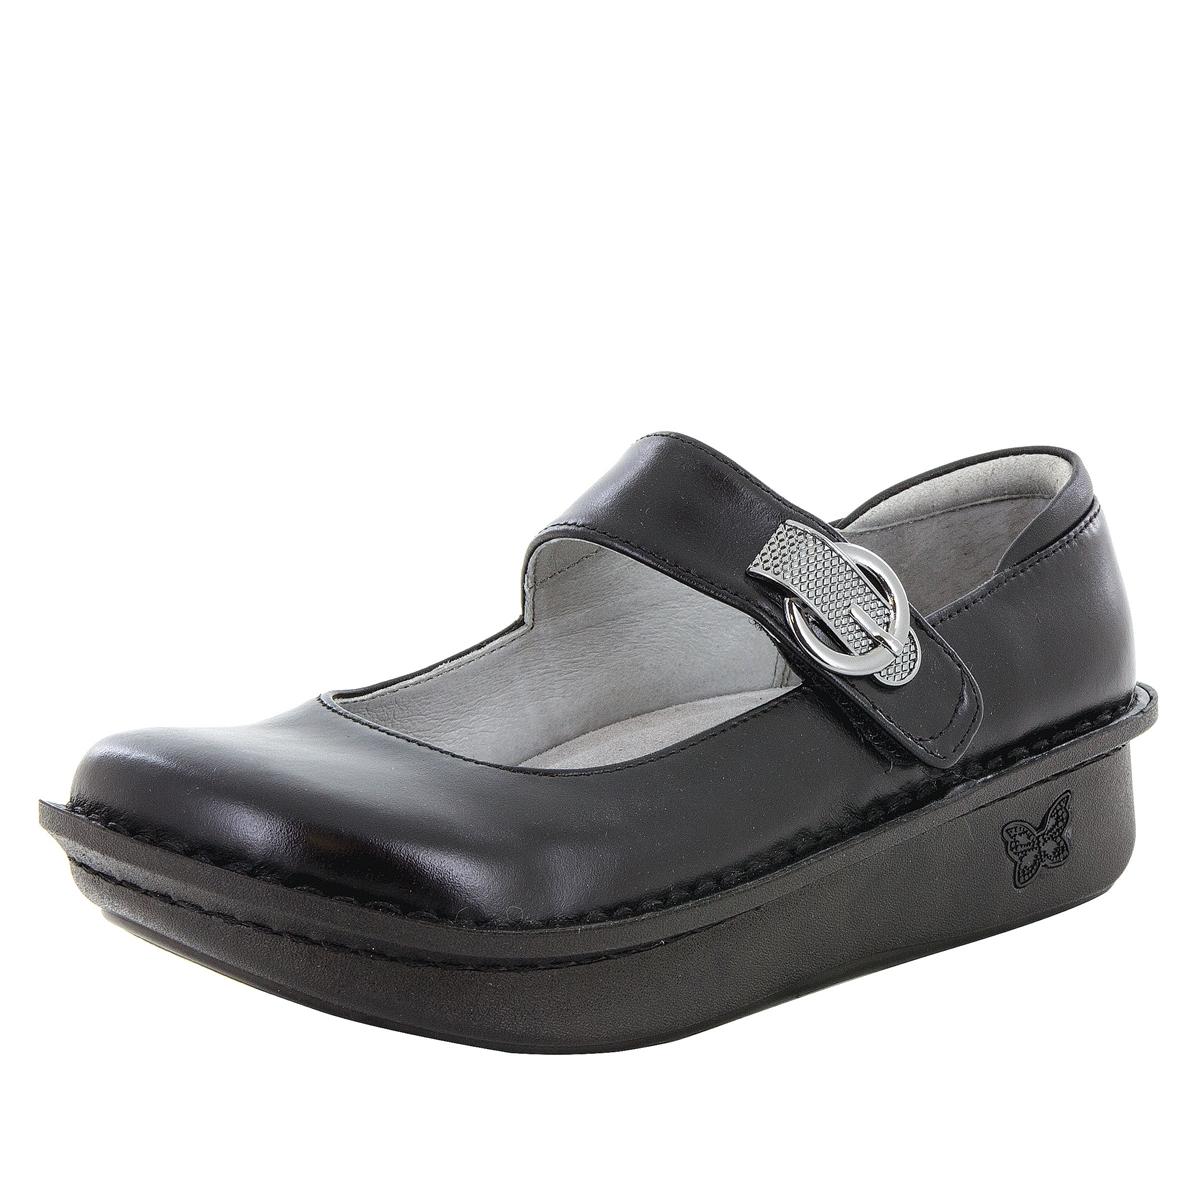 Alegria Shoes - Paloma Jet Luster